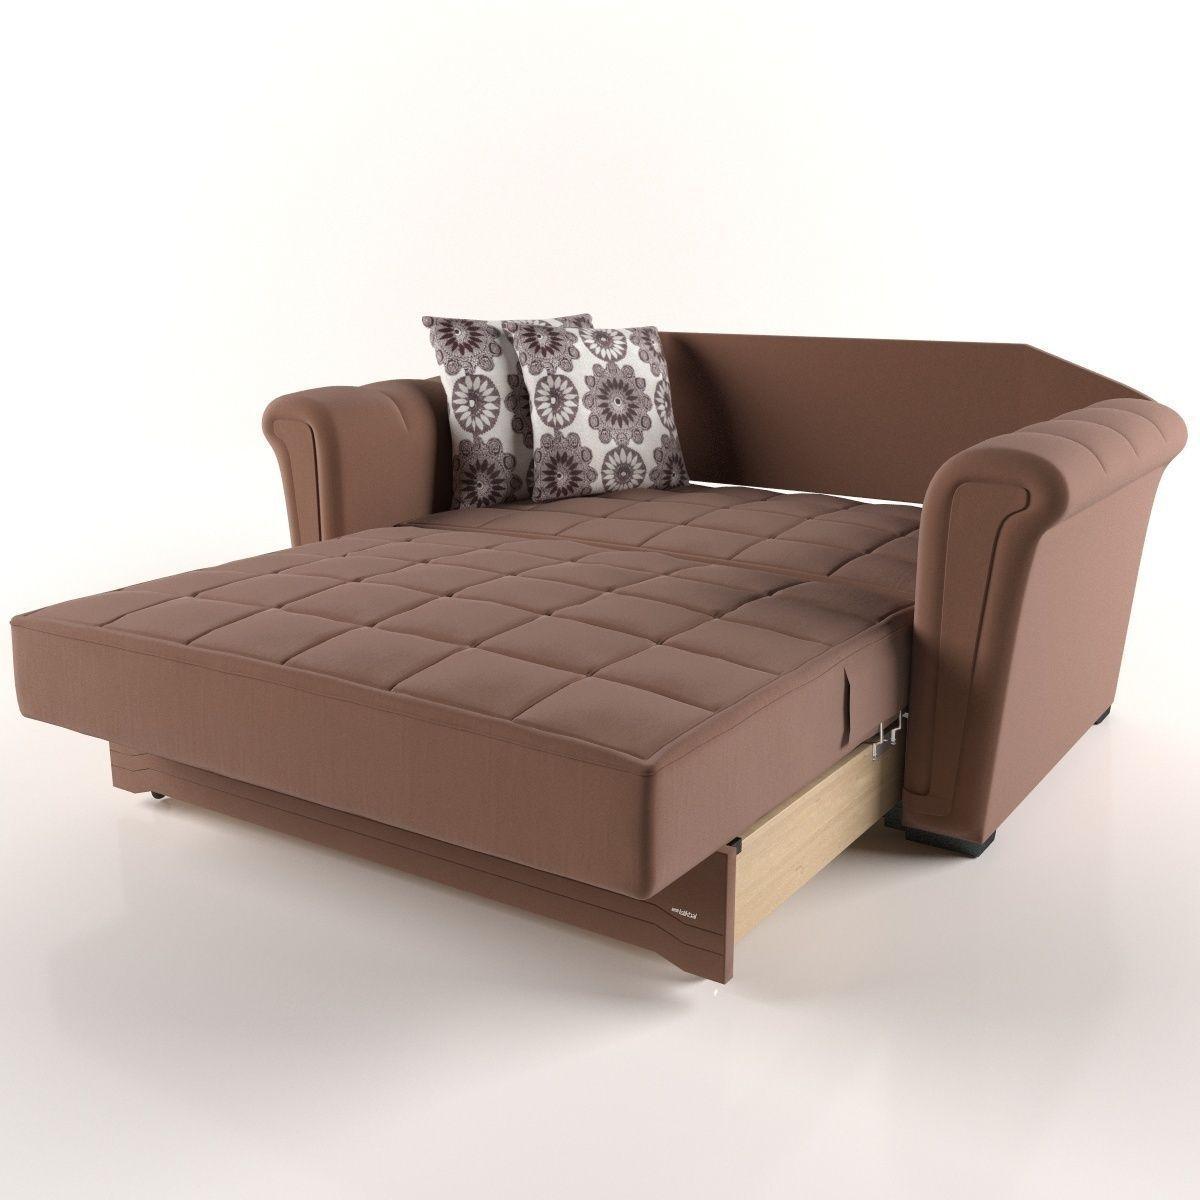 Sofa Bed Qoo10: Low Sofa Bed Qoo10 123cm Hermes Low Sofa Sofabed Unique